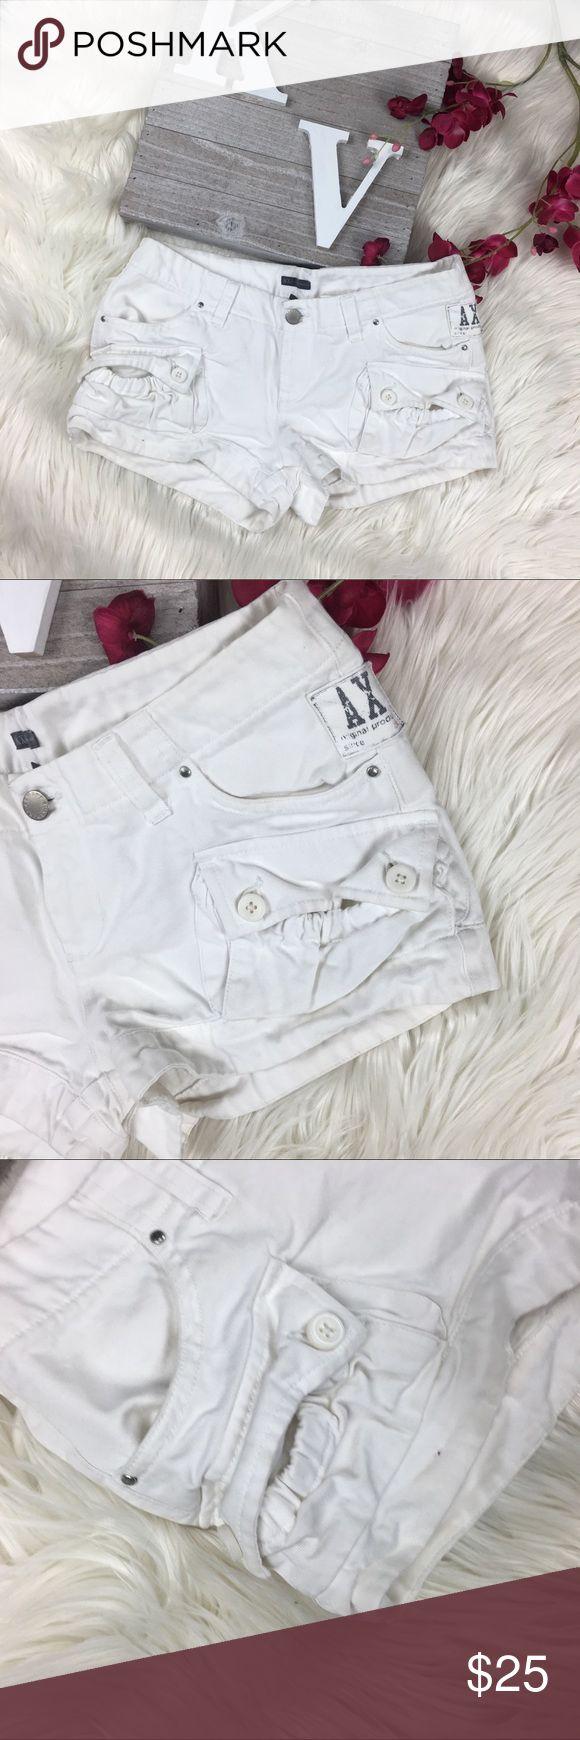 ARMANI EXCHANGE Cargo Pocket mini booty Shorts ARMANI EXCHANGE size 0 White Cargo Pocket mini booty short Shorts  Laid Flat  Waist 14 Inseam 2 Rise 7 A/X Armani Exchange Shorts Cargos